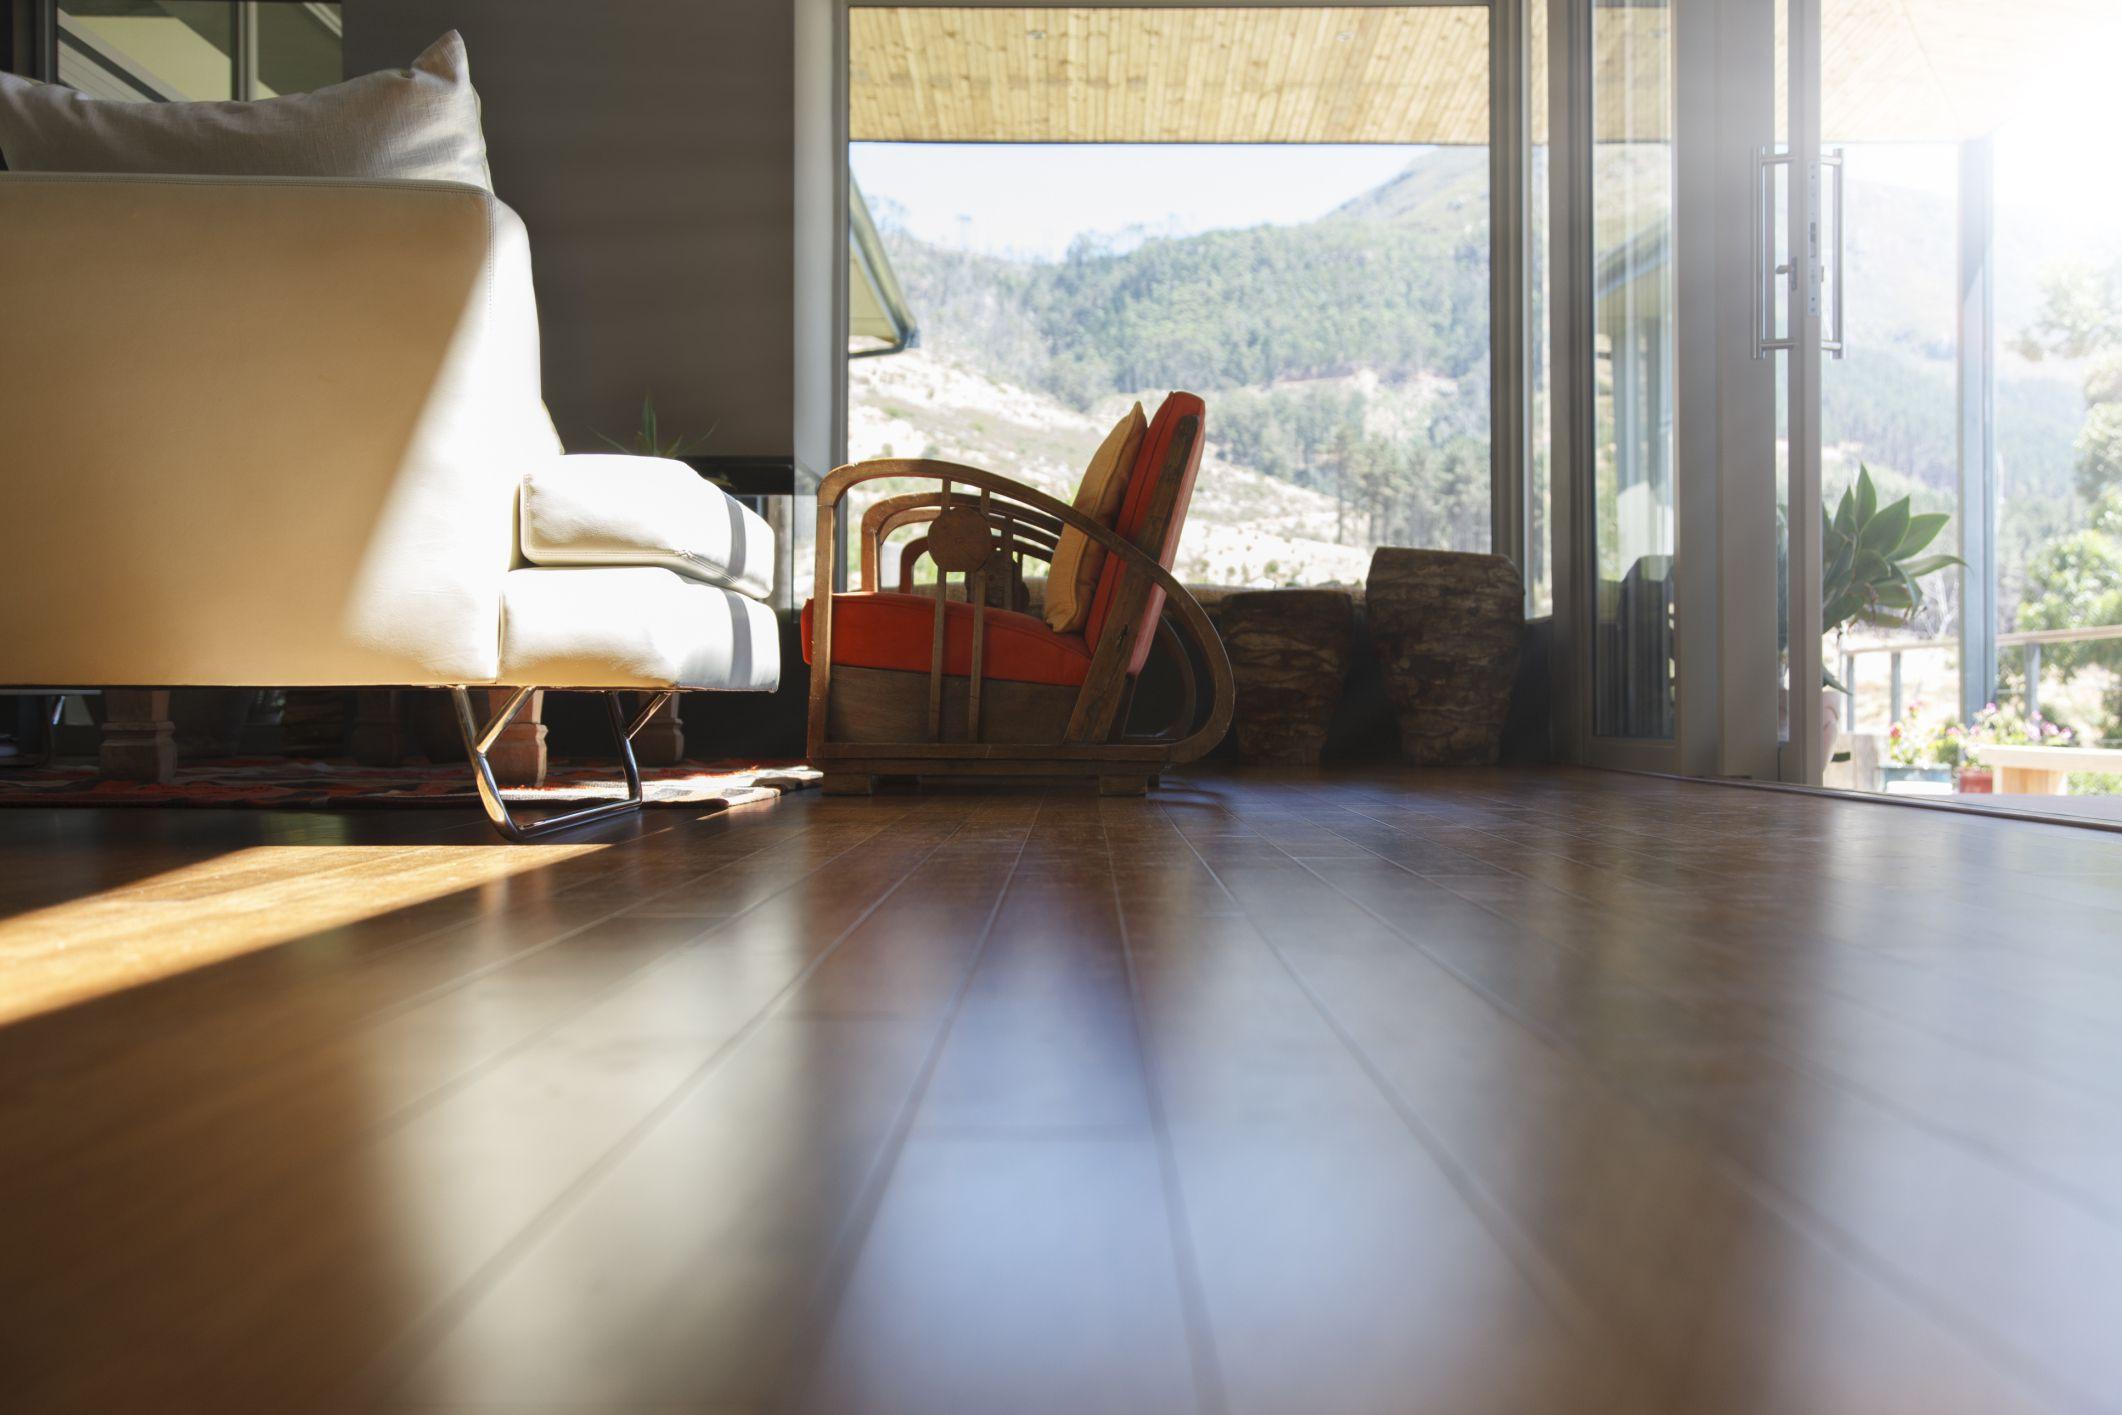 wide plank hardwood flooring canada of 5 best luxury vinyl plank floors regarding exotic hardwood flooring 525439899 56a49d3a3df78cf77283453d